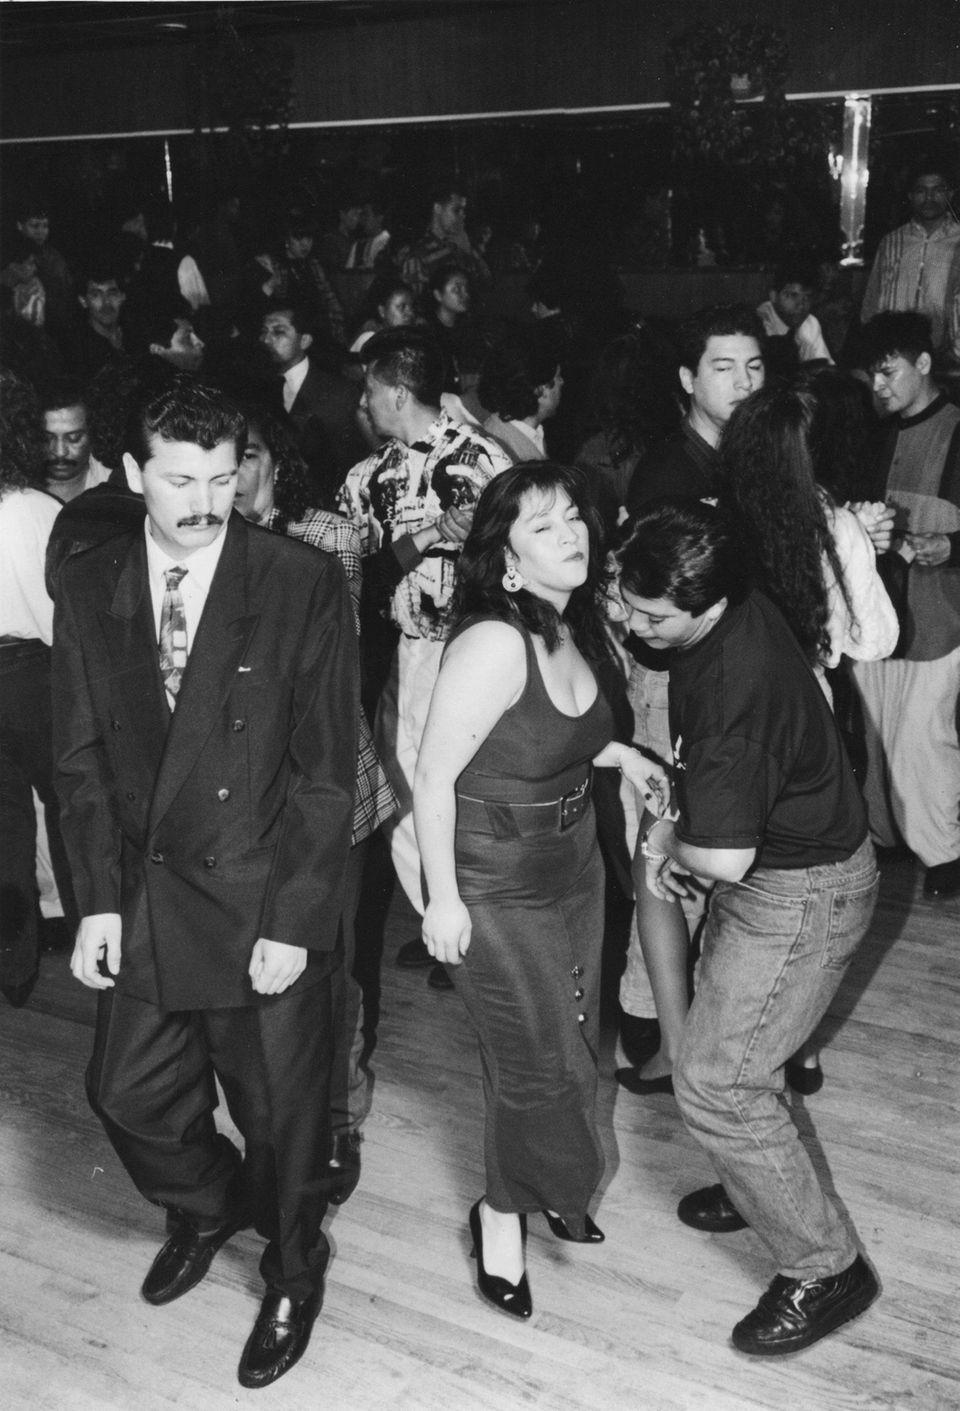 Dancing at El Palacio Latino in Hempstead on